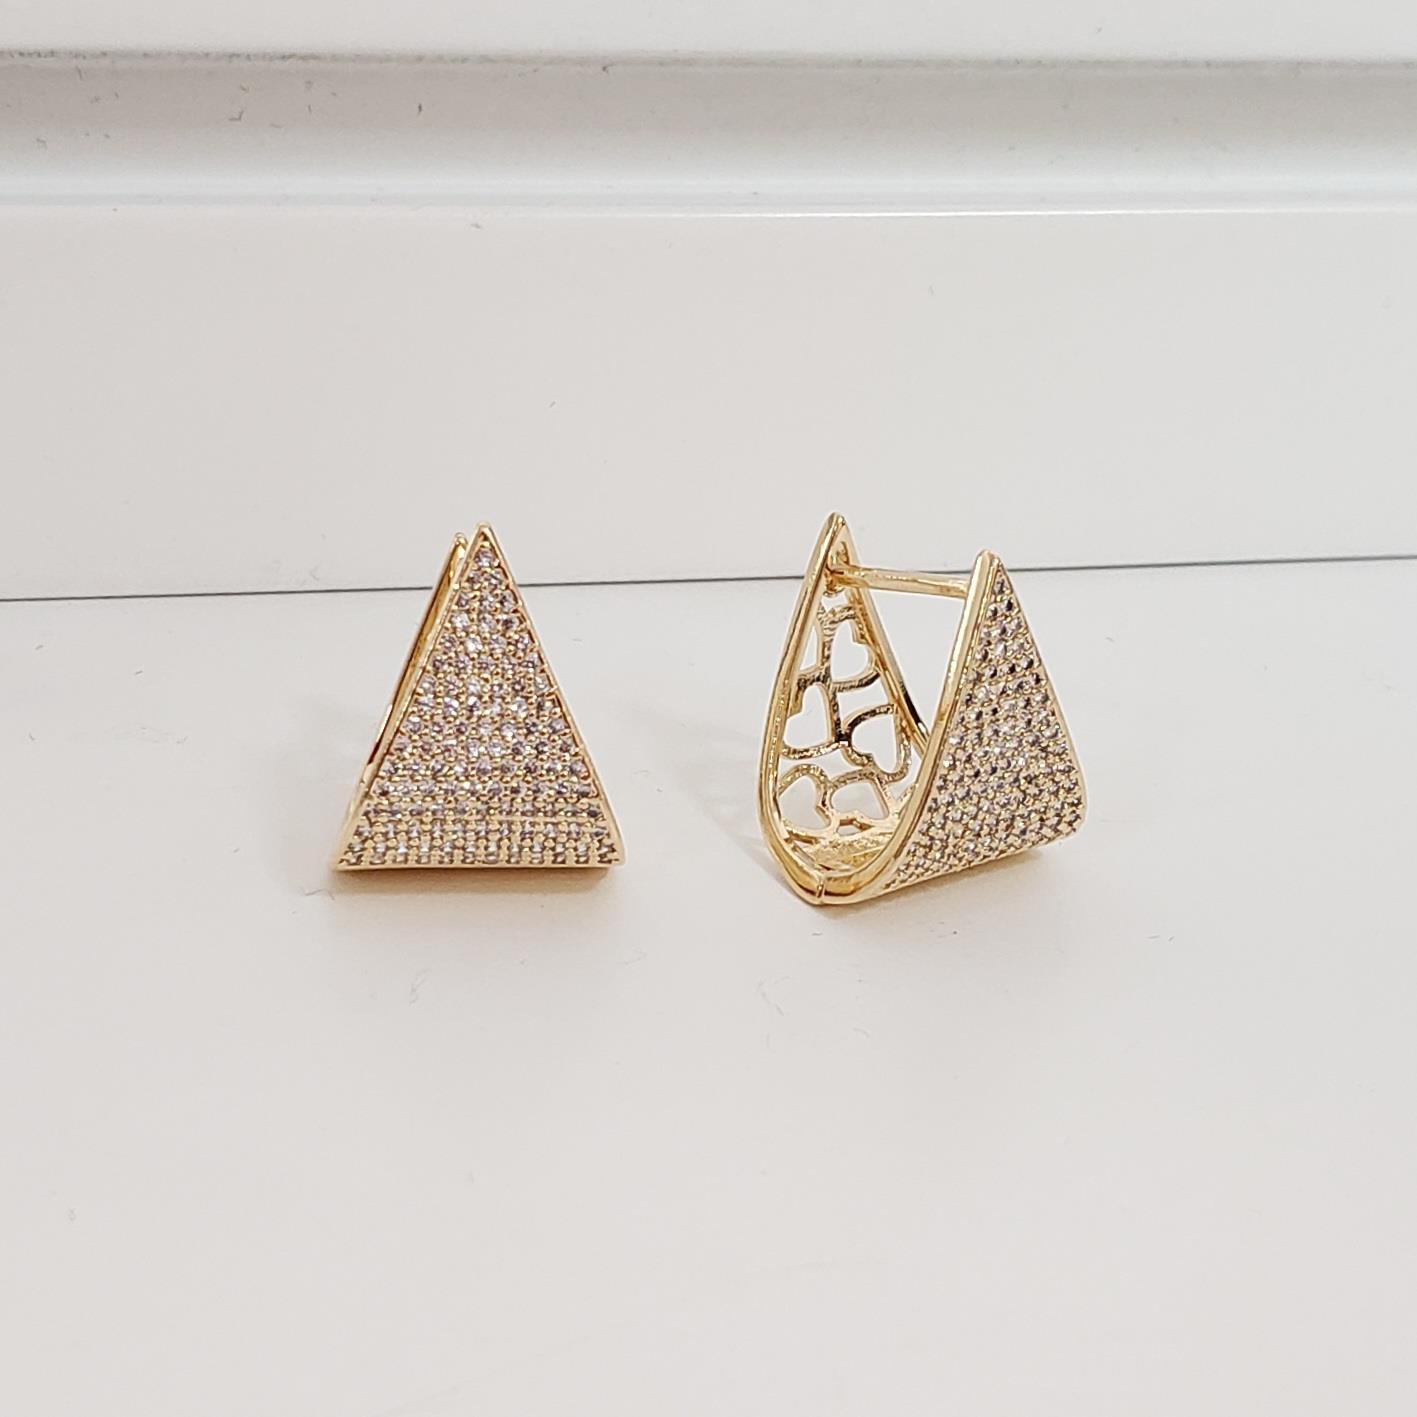 Brinco Argola 2cm Triangular Zircônia no Banho Ouro 18k Semijoia